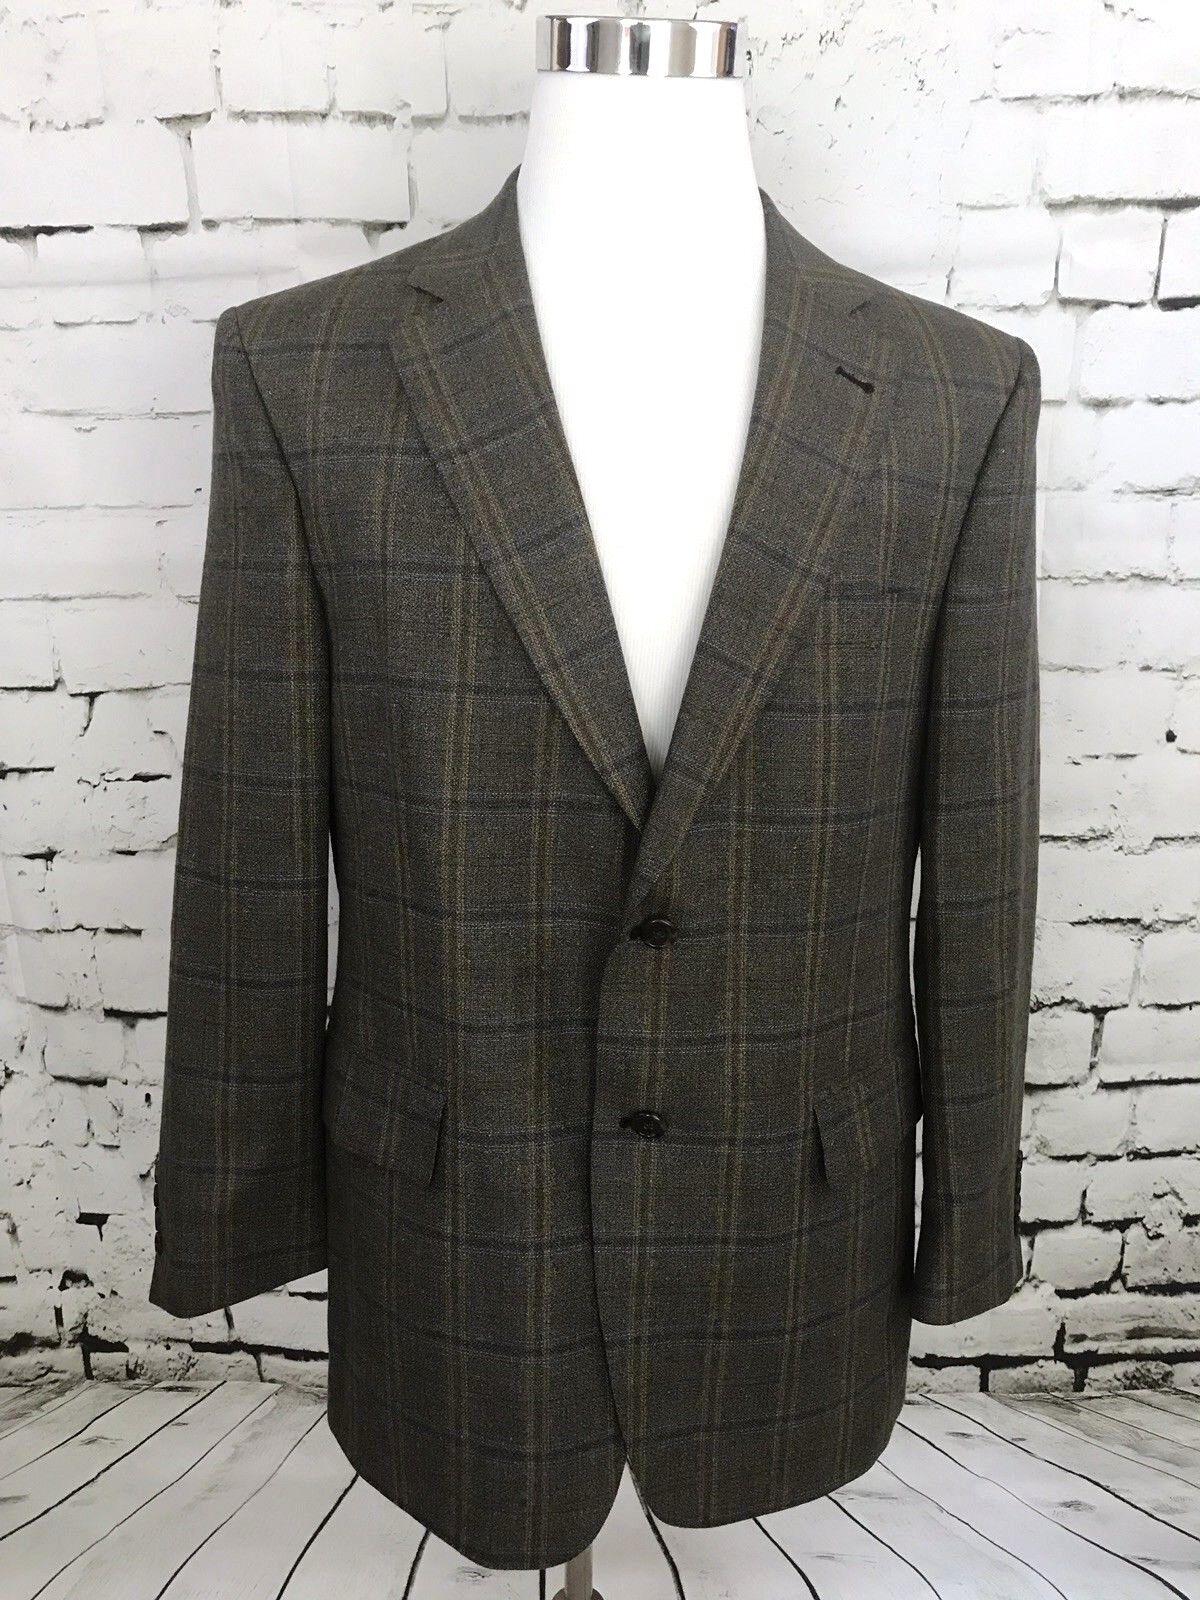 Jos A Bank Windowpane Blazer 42R Silk Wool 2 Button Signature Collection